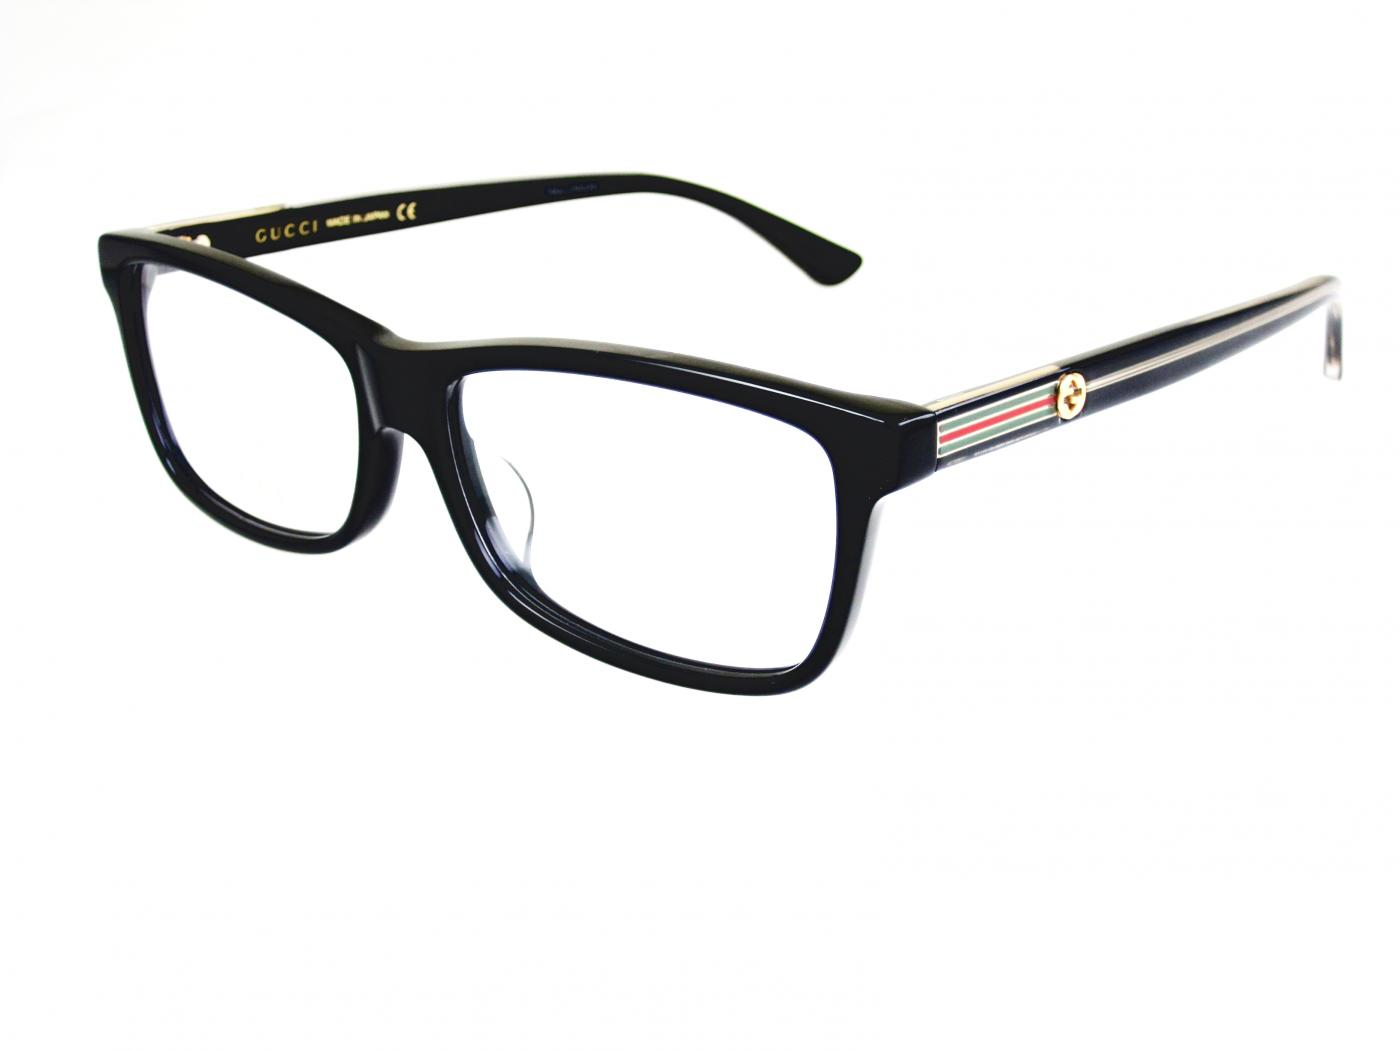 Unisex dioptrické okuliare Gucci 3c54b757de5